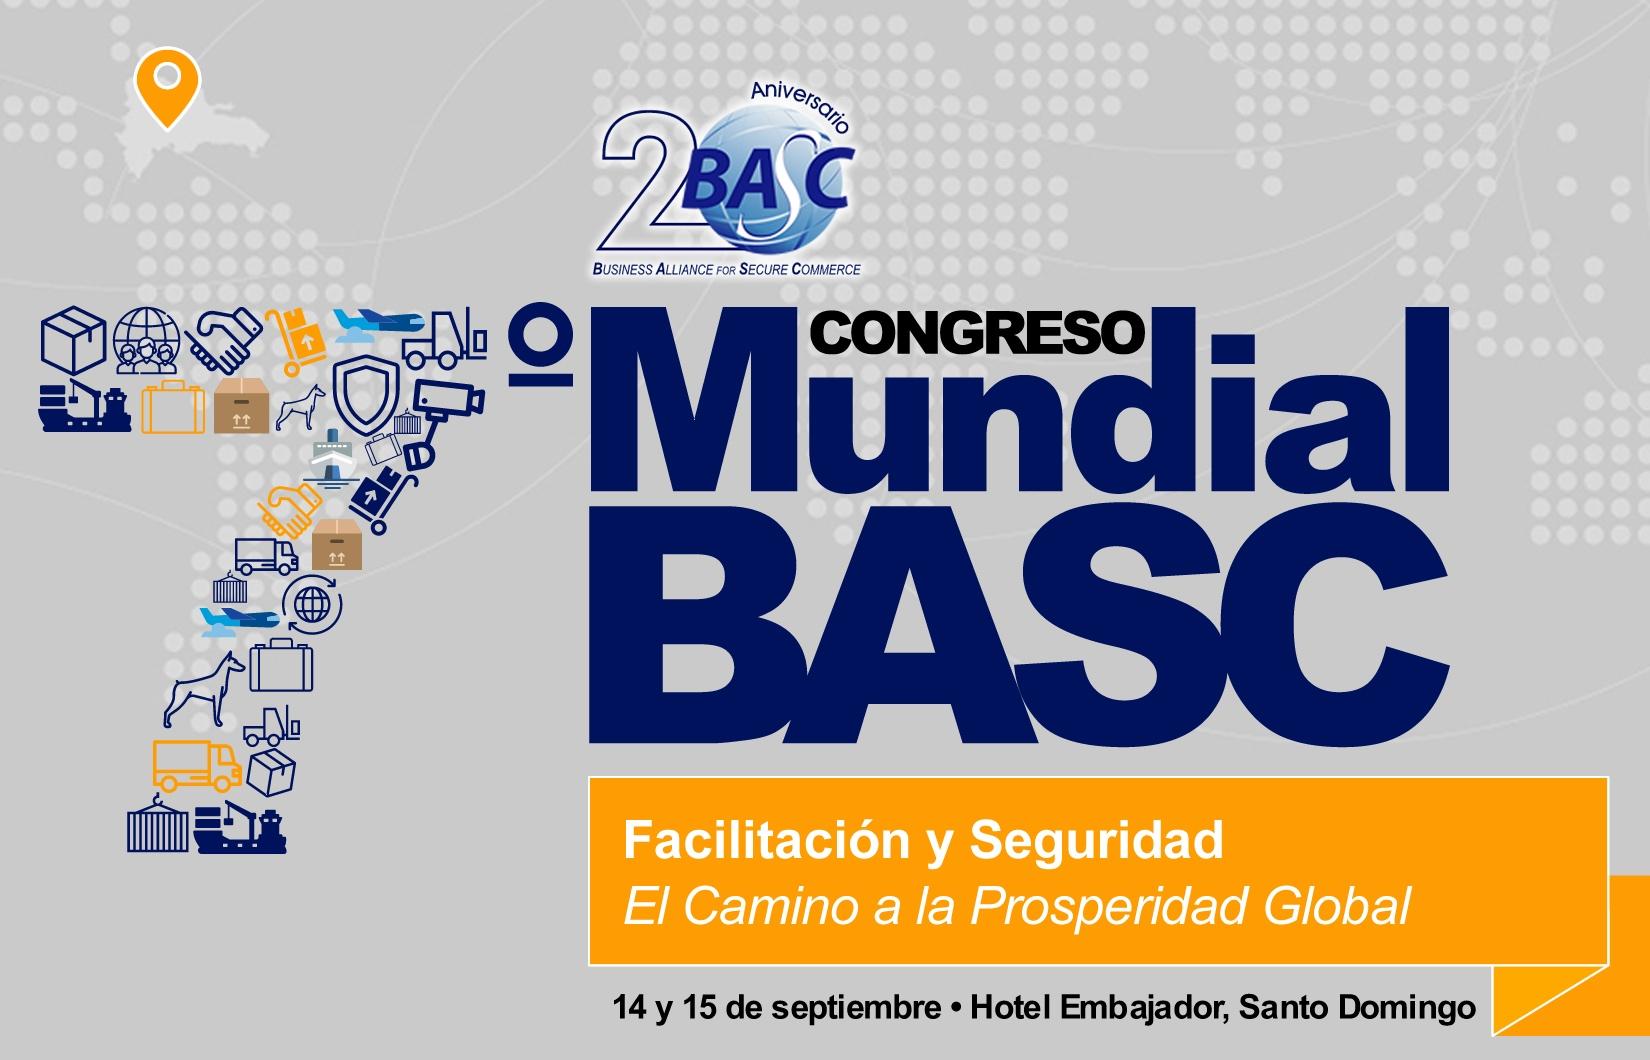 basc web inicio (3)